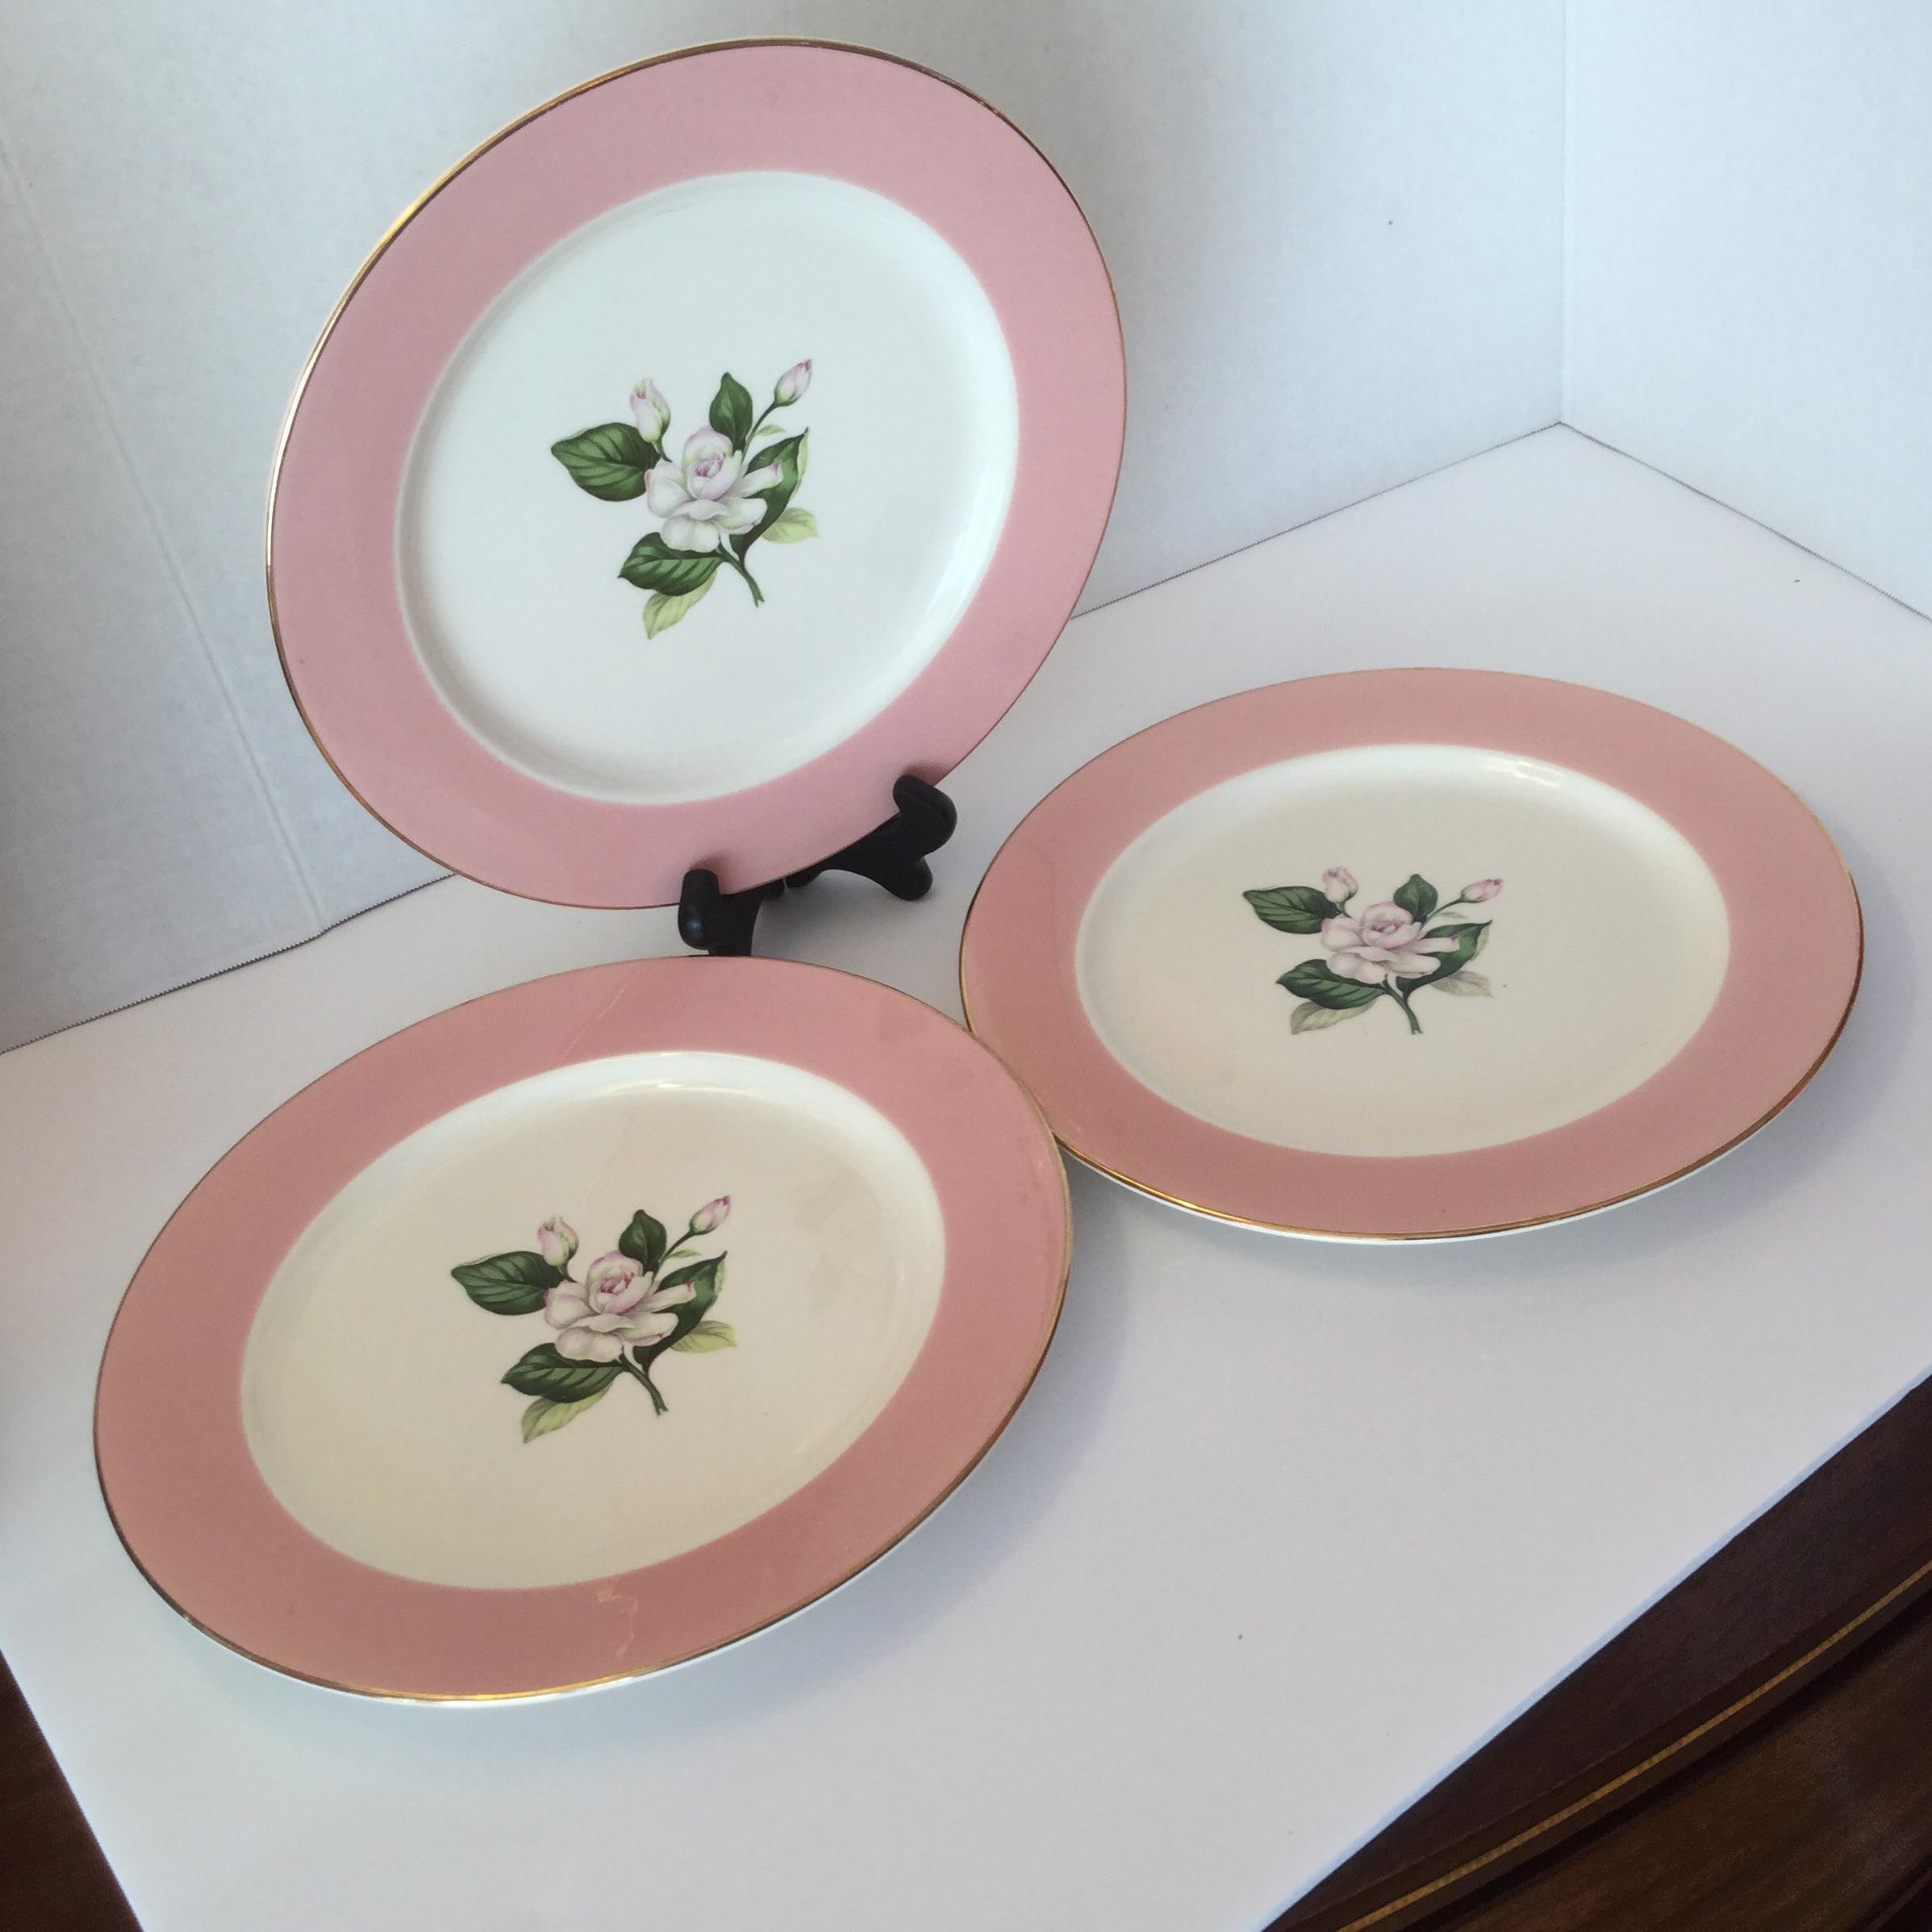 Mid-Century Pink Dinner Plates - Set of 3 - Image 2 of 11 & Mid-Century Pink Dinner Plates - Set of 3   Chairish